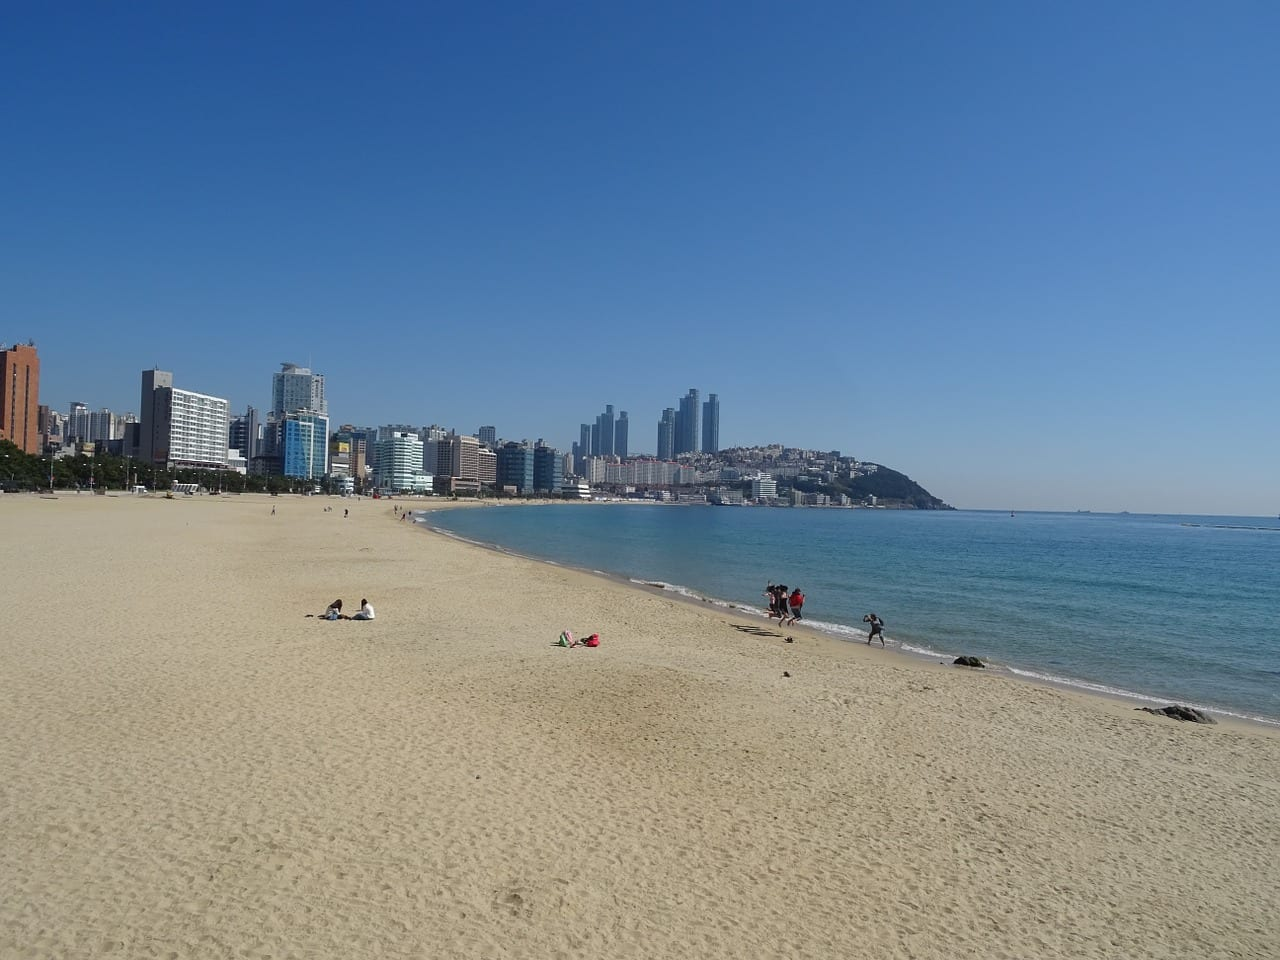 Playa Haeundae Bañar La Playa Busan Corea del Sur